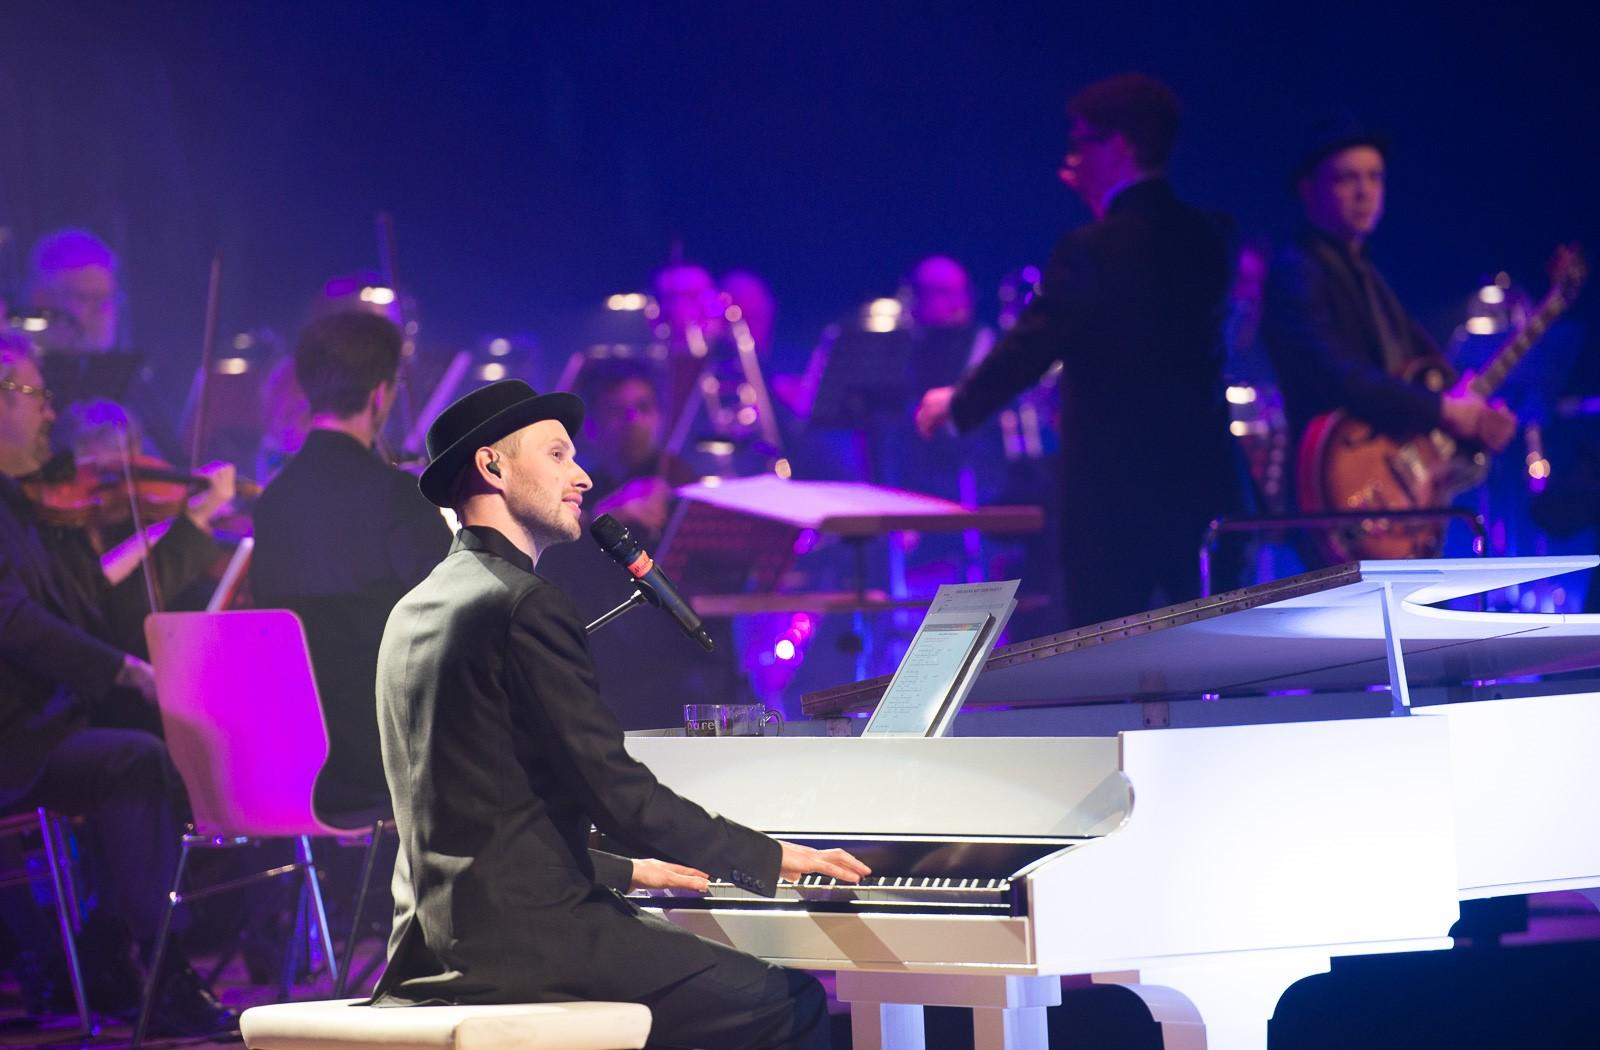 Schmitt singt Jürgens - Die Udo Jürgens Show